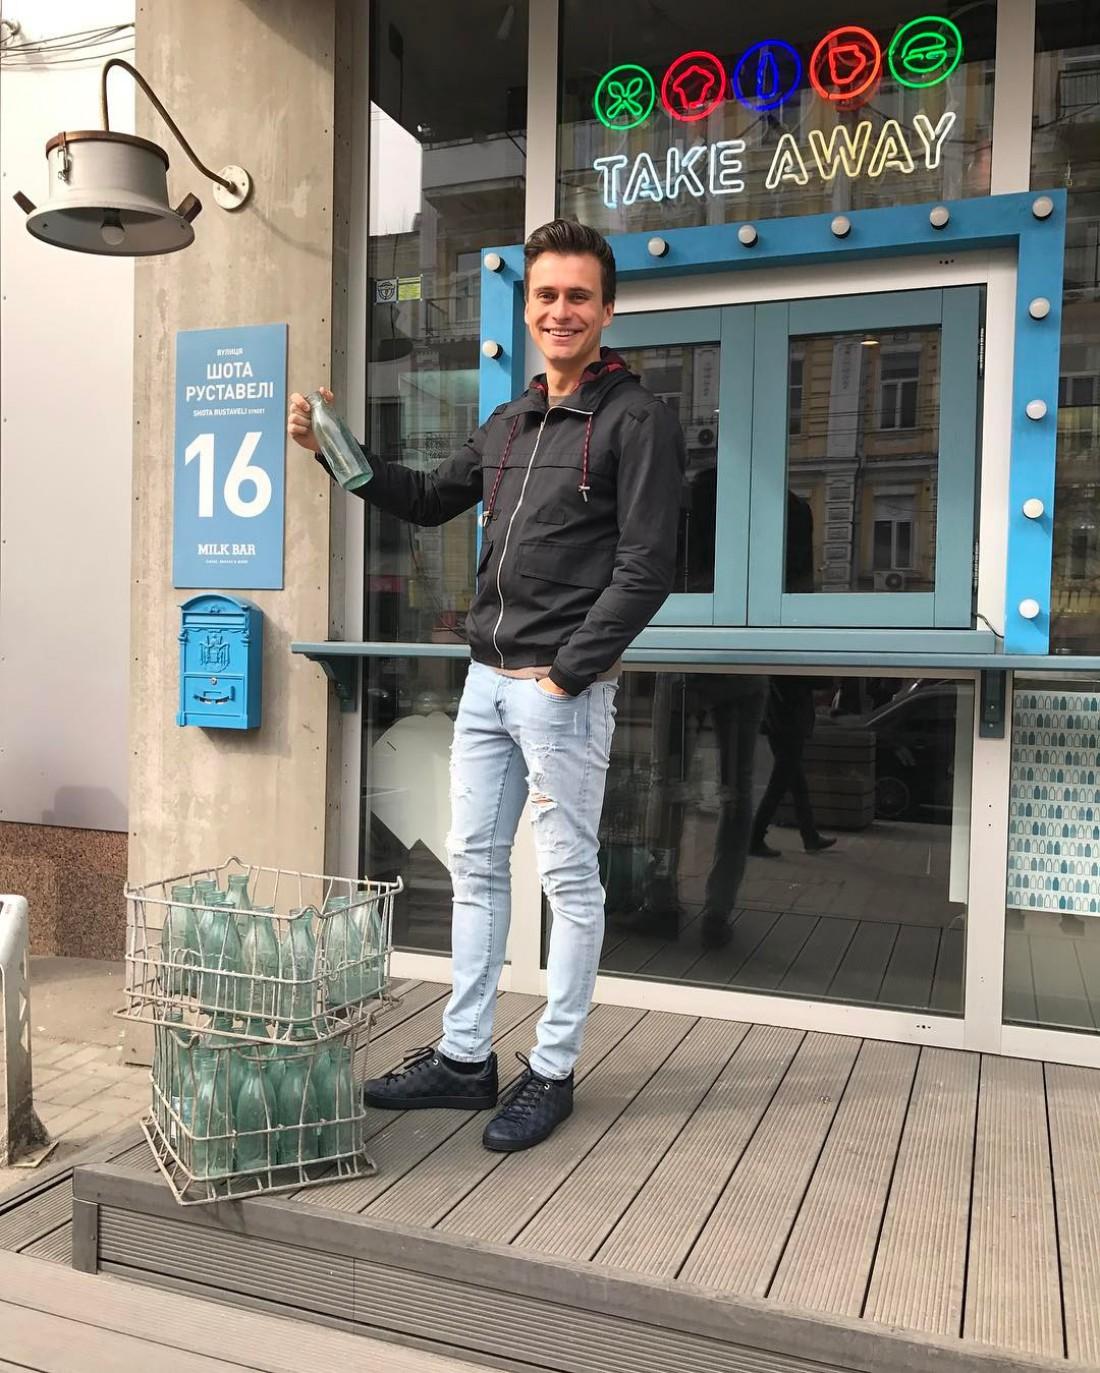 Евровидение 2017 Украина: Александр Скичко